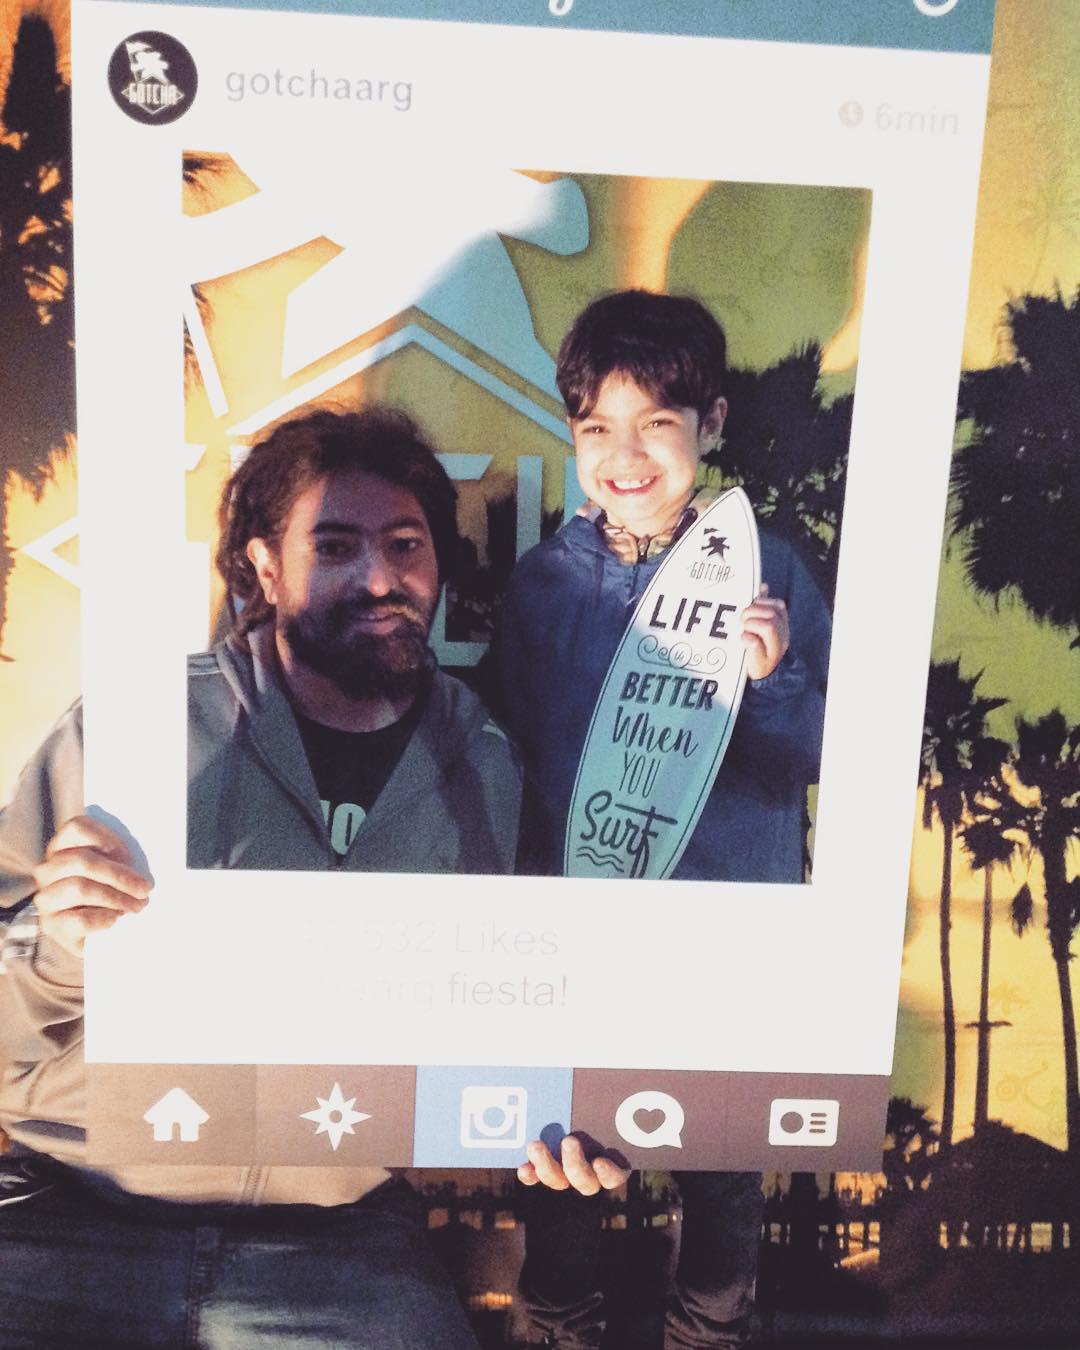 @chino5621 y Santino! #batero pasaron por @boardsandart #9 @gotchaarg